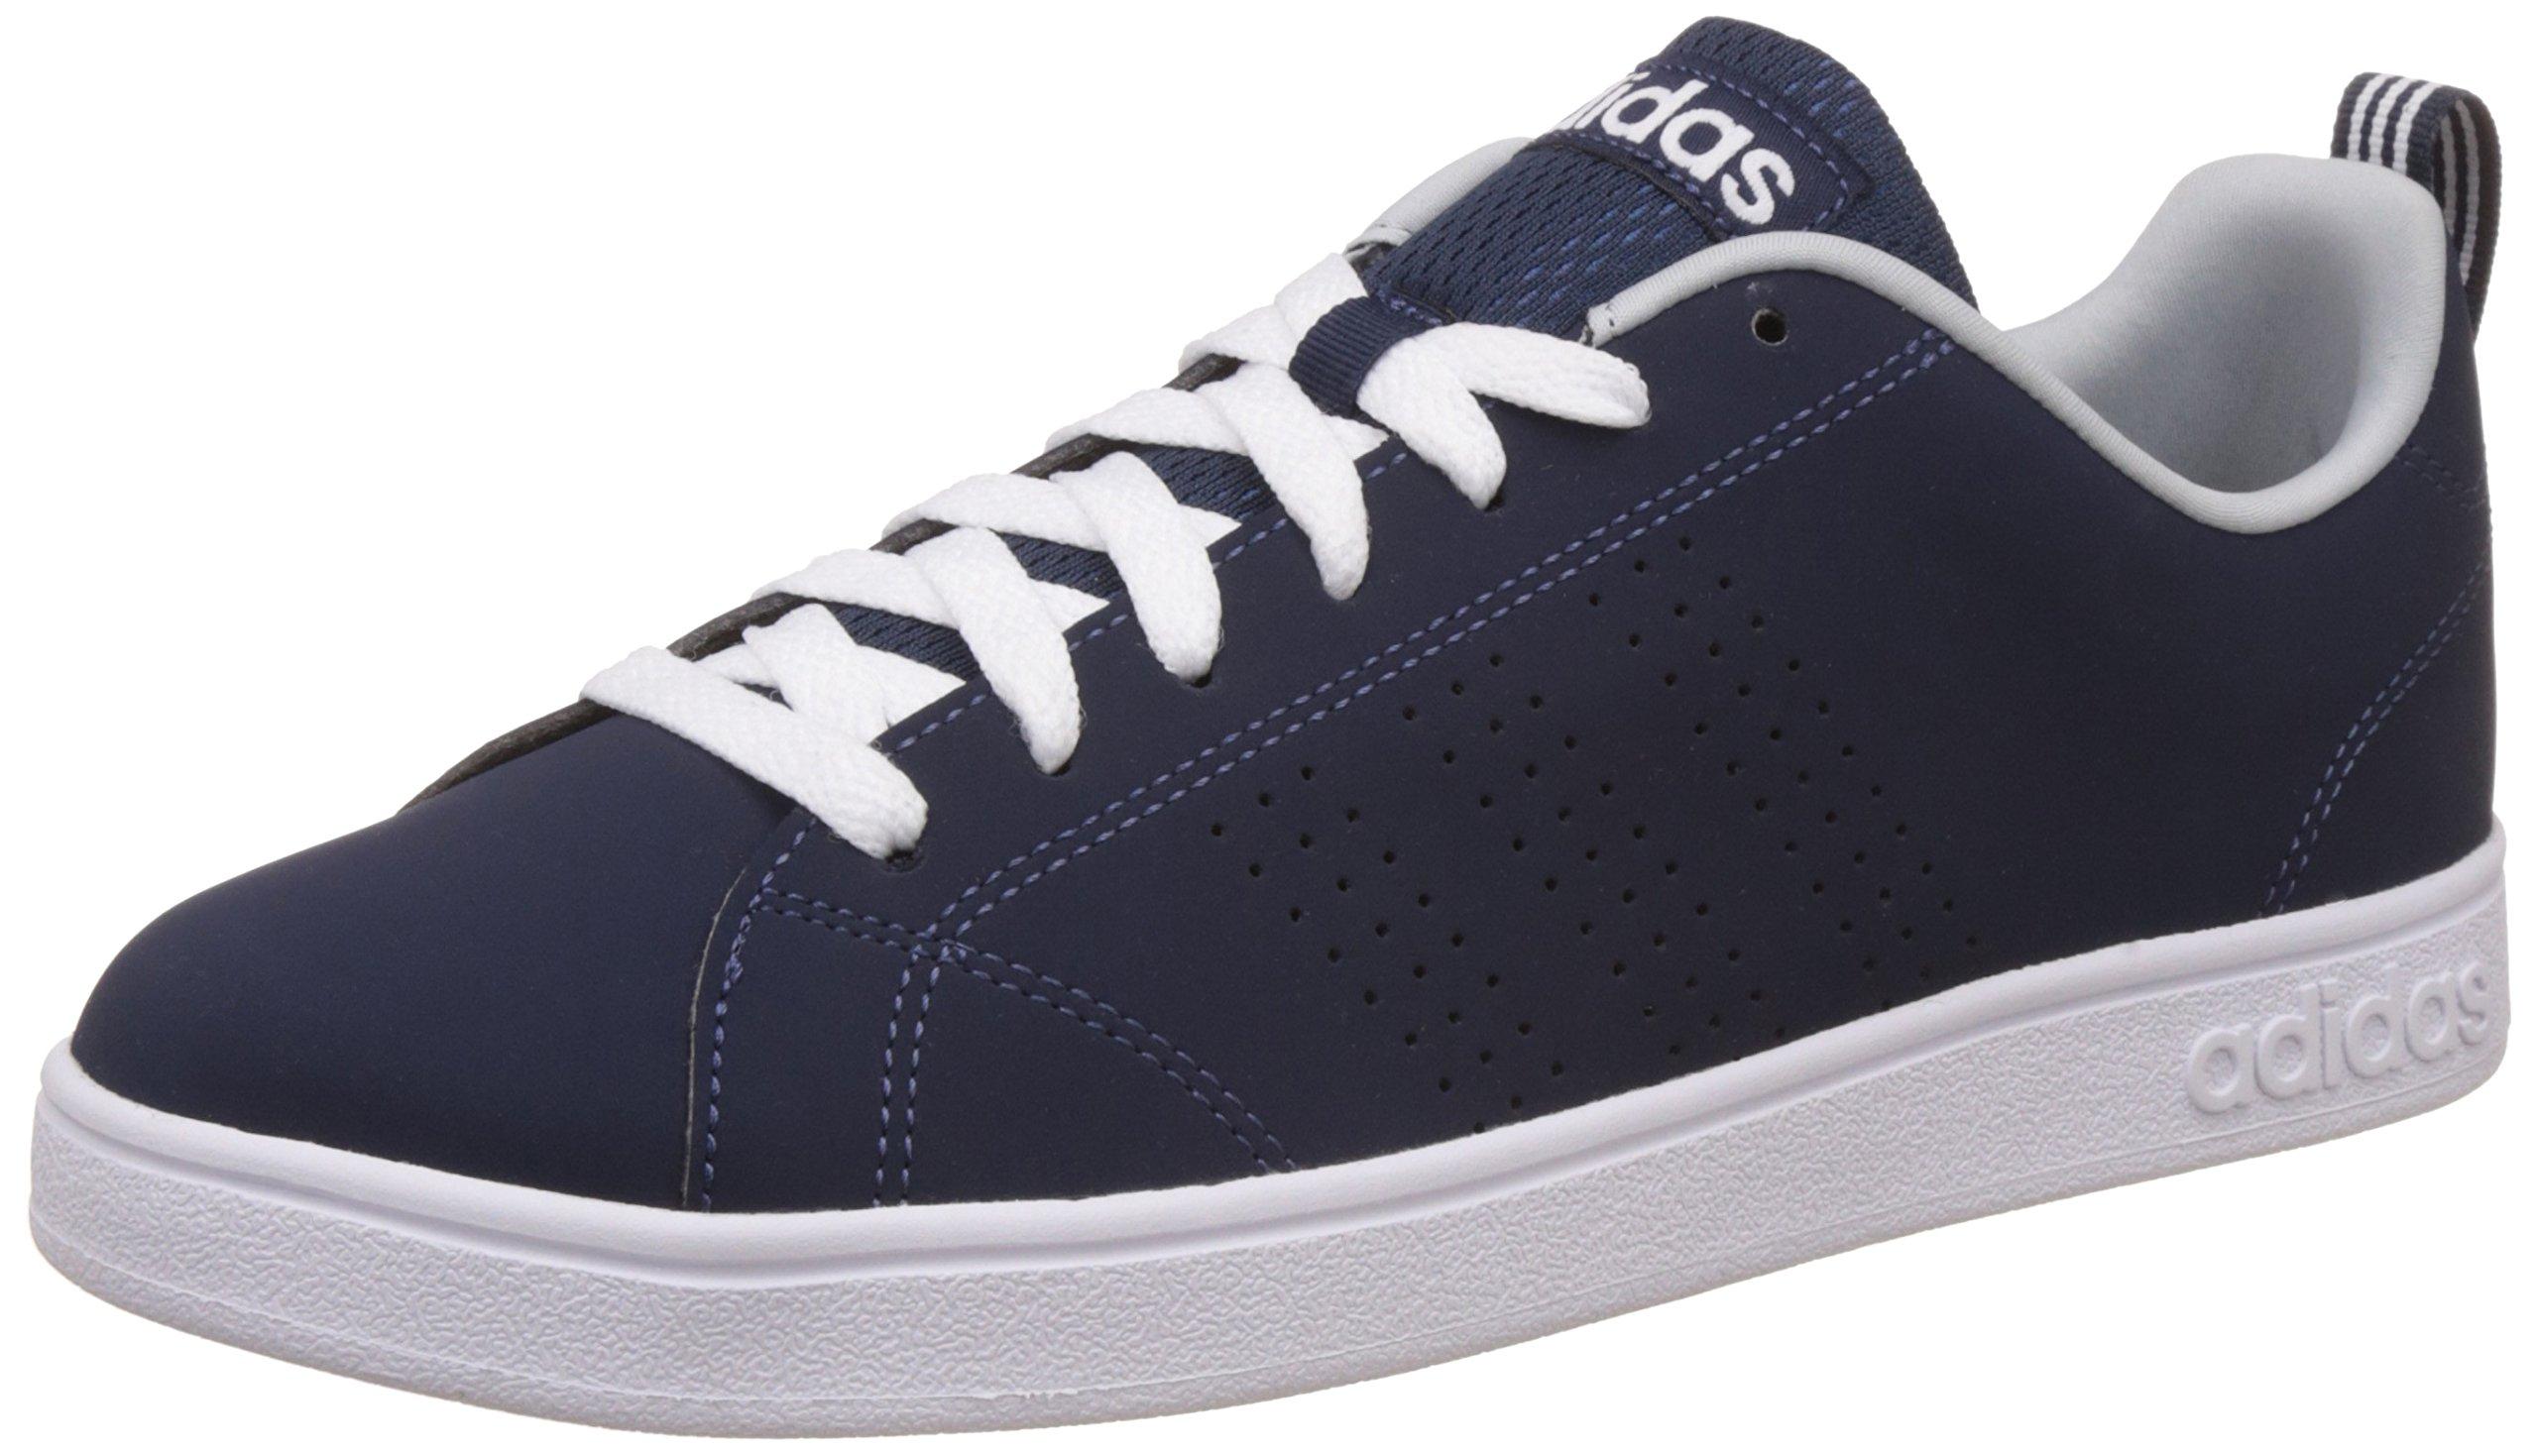 Adidas NEO Advantage Clean VS, Scarpe da Ginnastica Uomo 1 spesavip